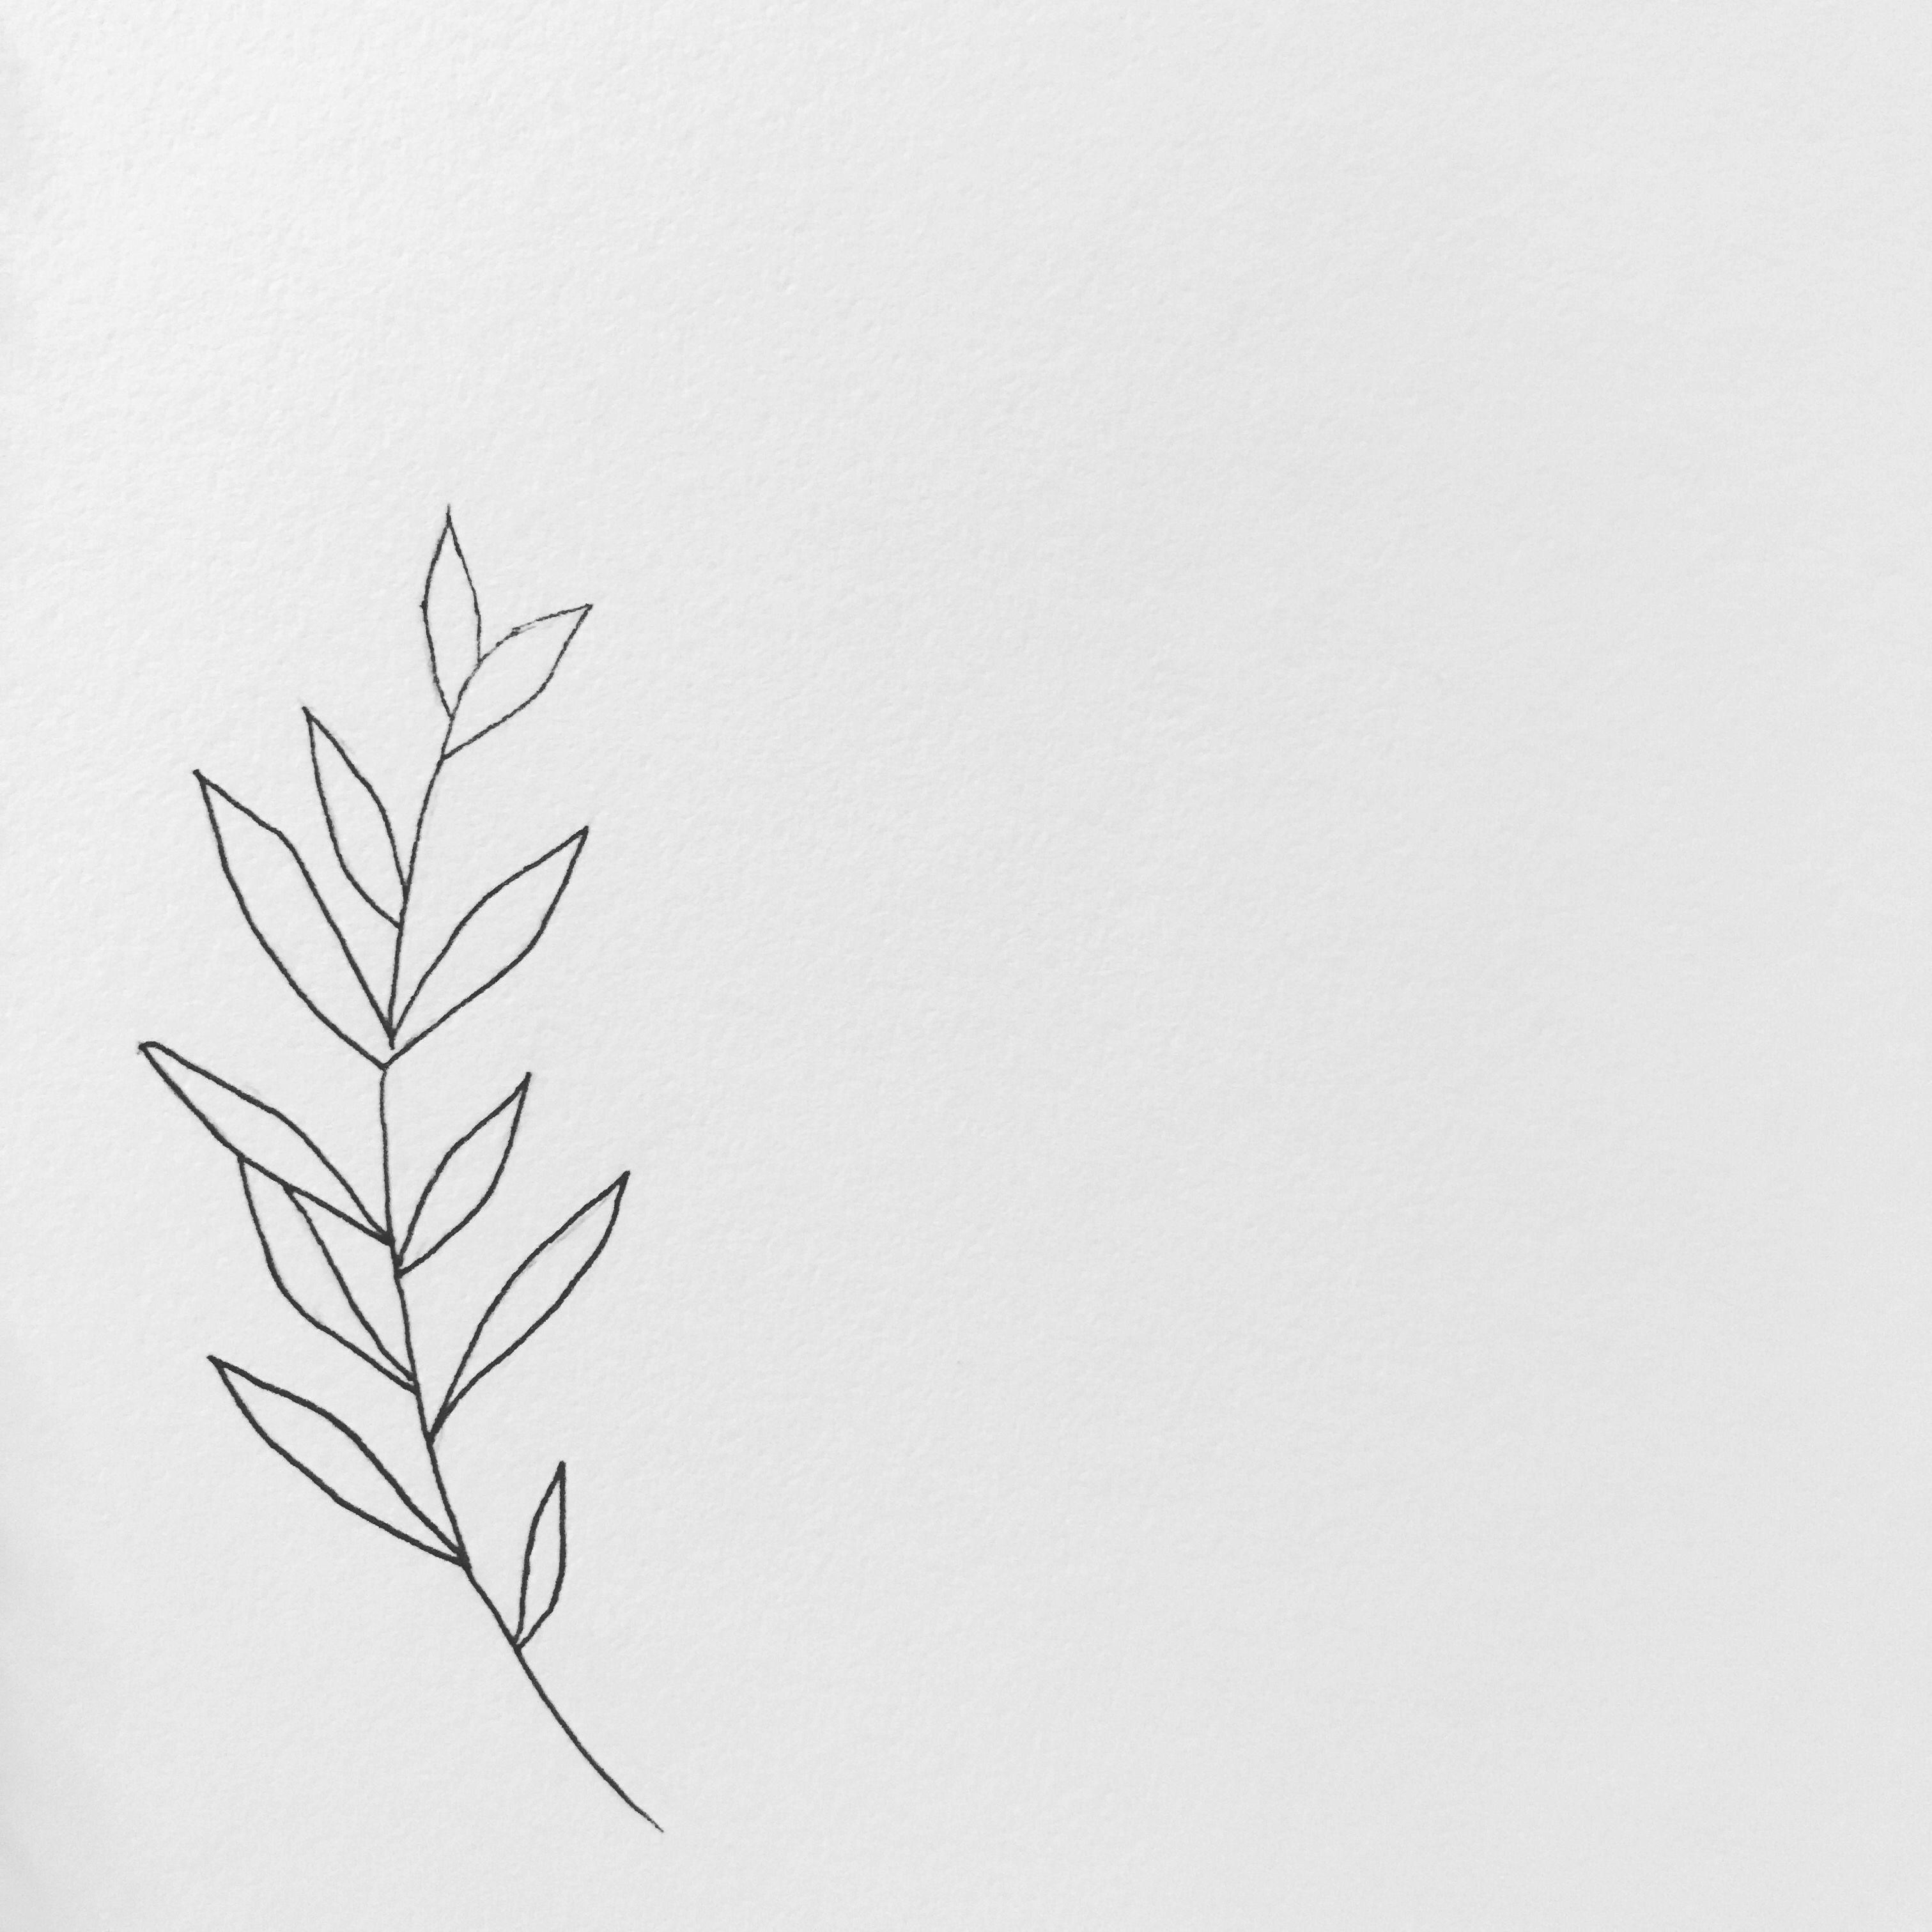 Small Acid Tattoo: #minimalist #blackandwhite #pen #sketchbook